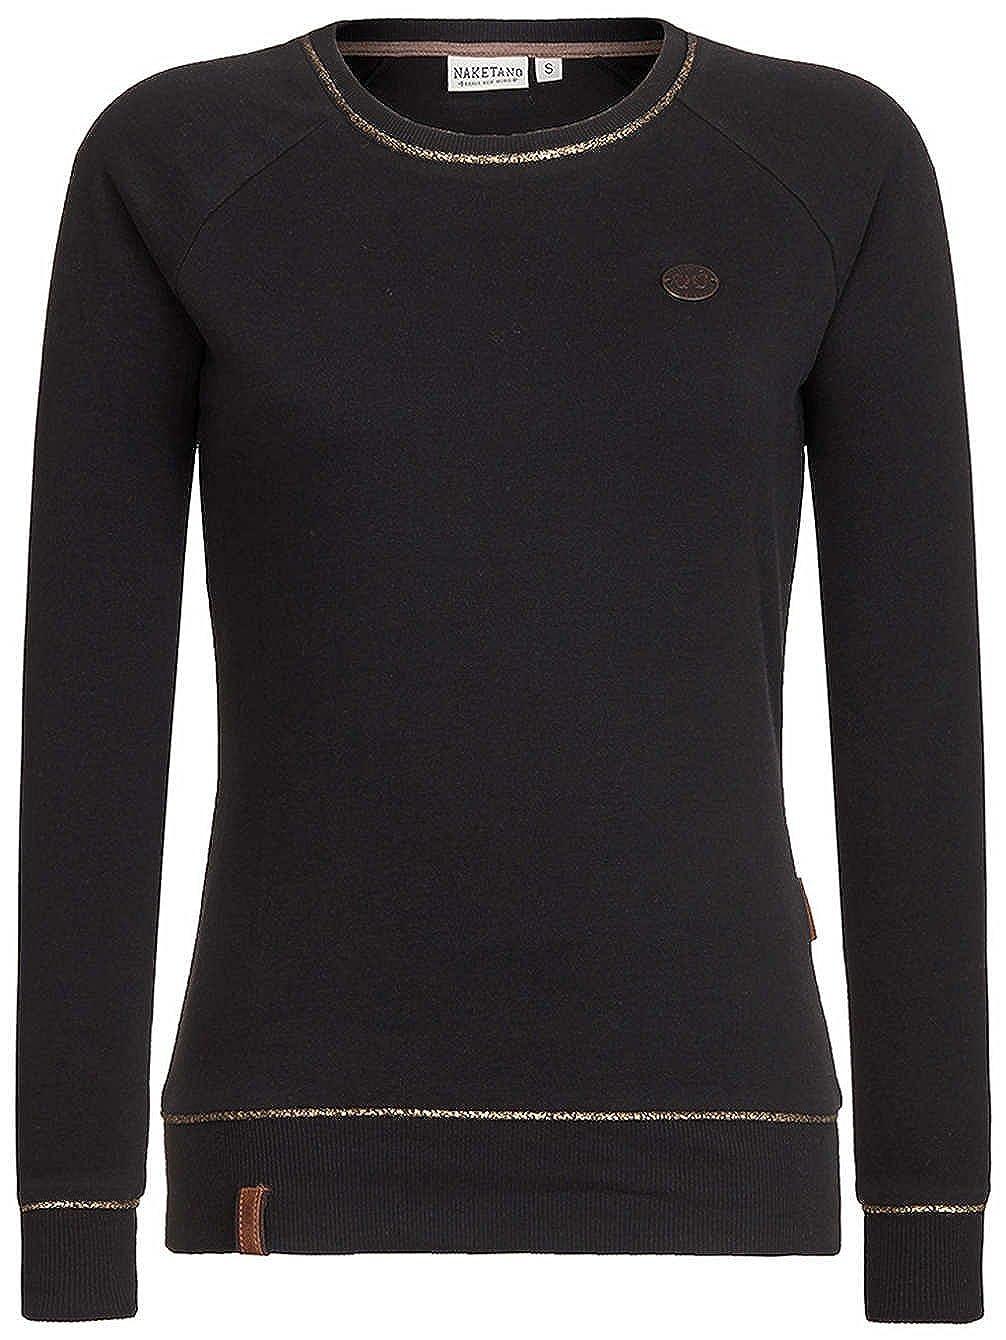 Naketano Damen Sweater Wof/Ã/¼r Reden Sweater